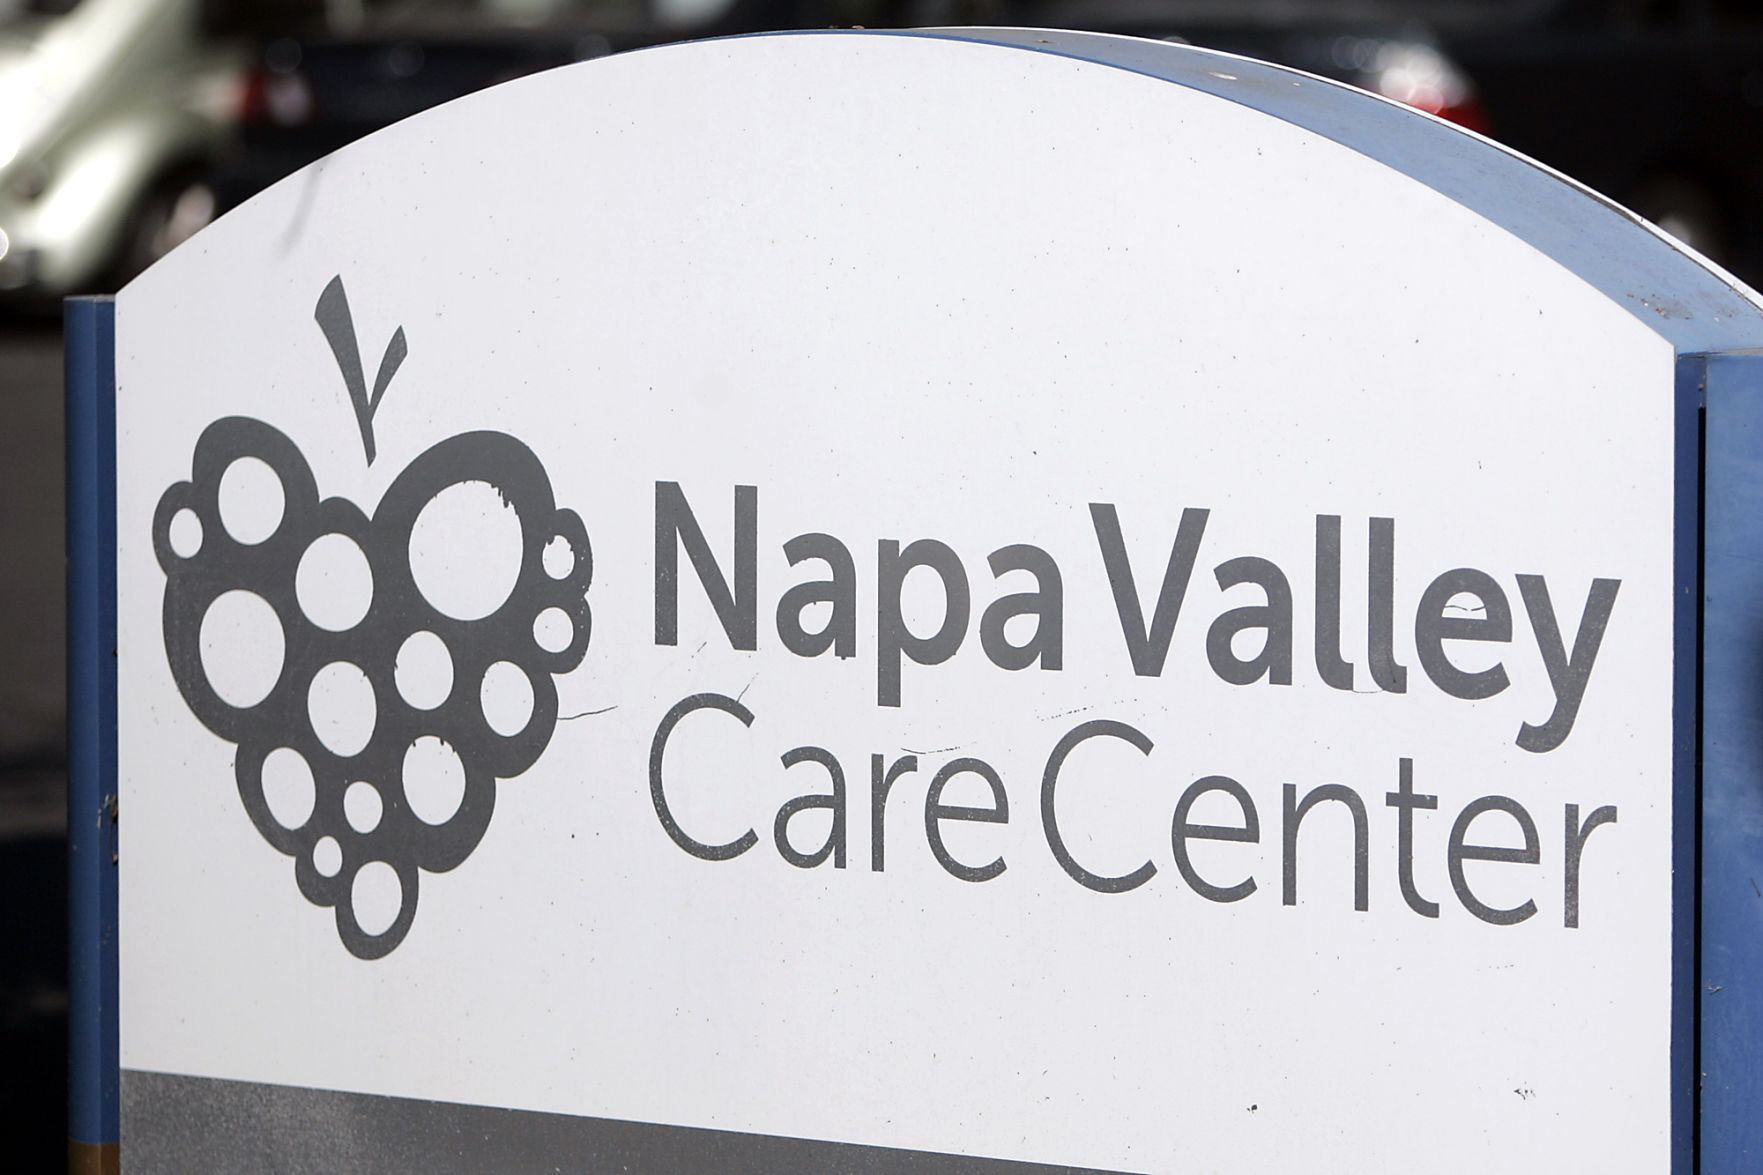 Napa County Arrest Records by City